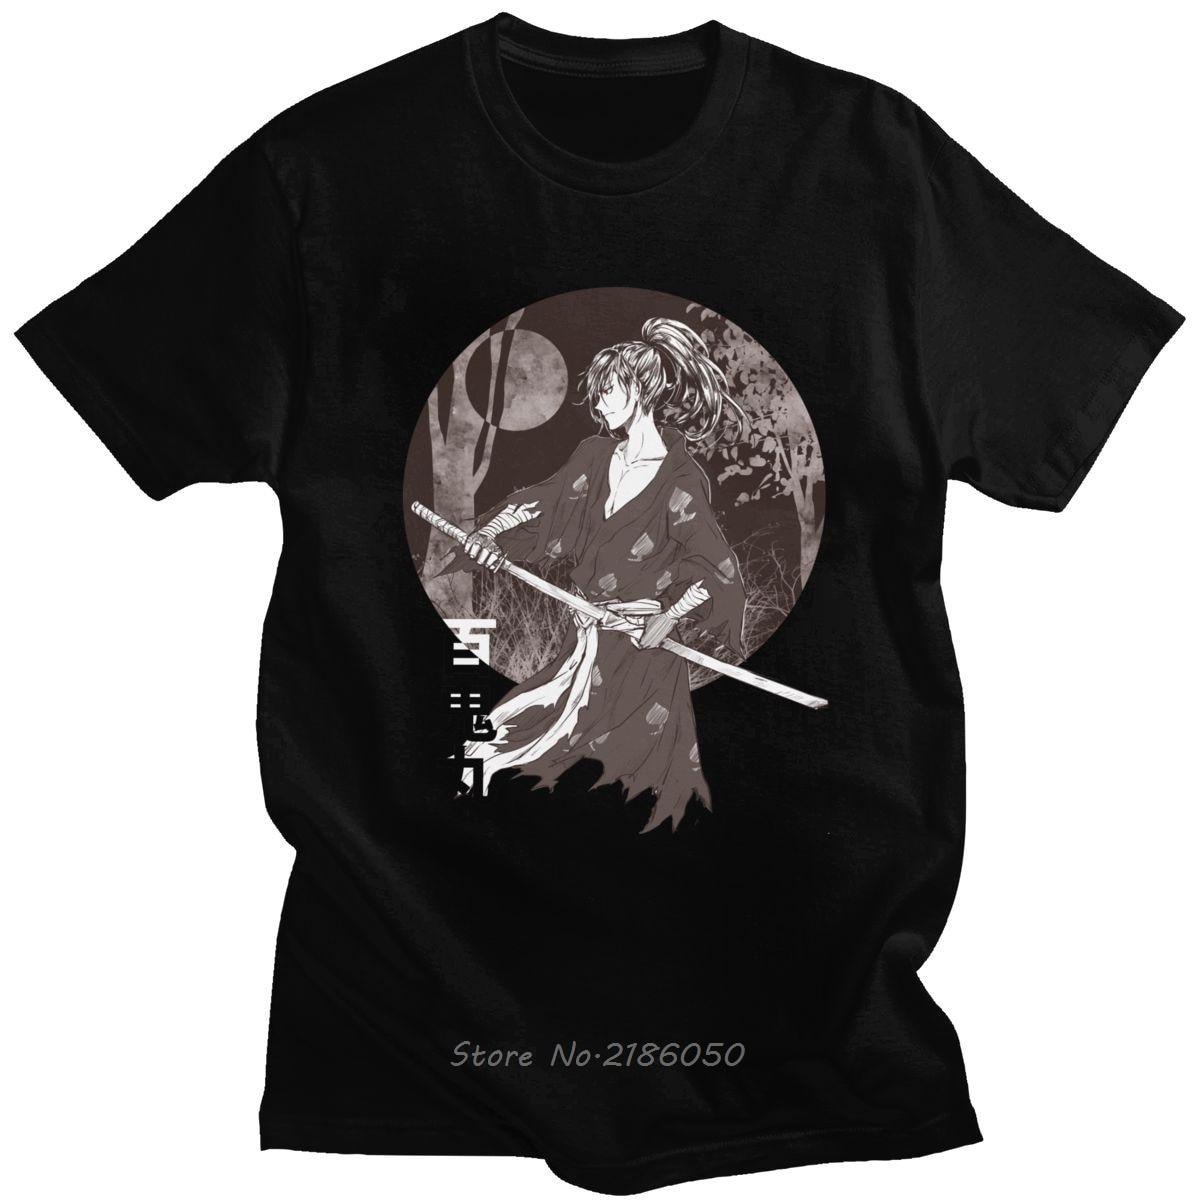 Clássico dororo hyakkimaru anime manga curta camiseta masculina espada gráfica samurai t camisa magro ajuste puro algodão t presente